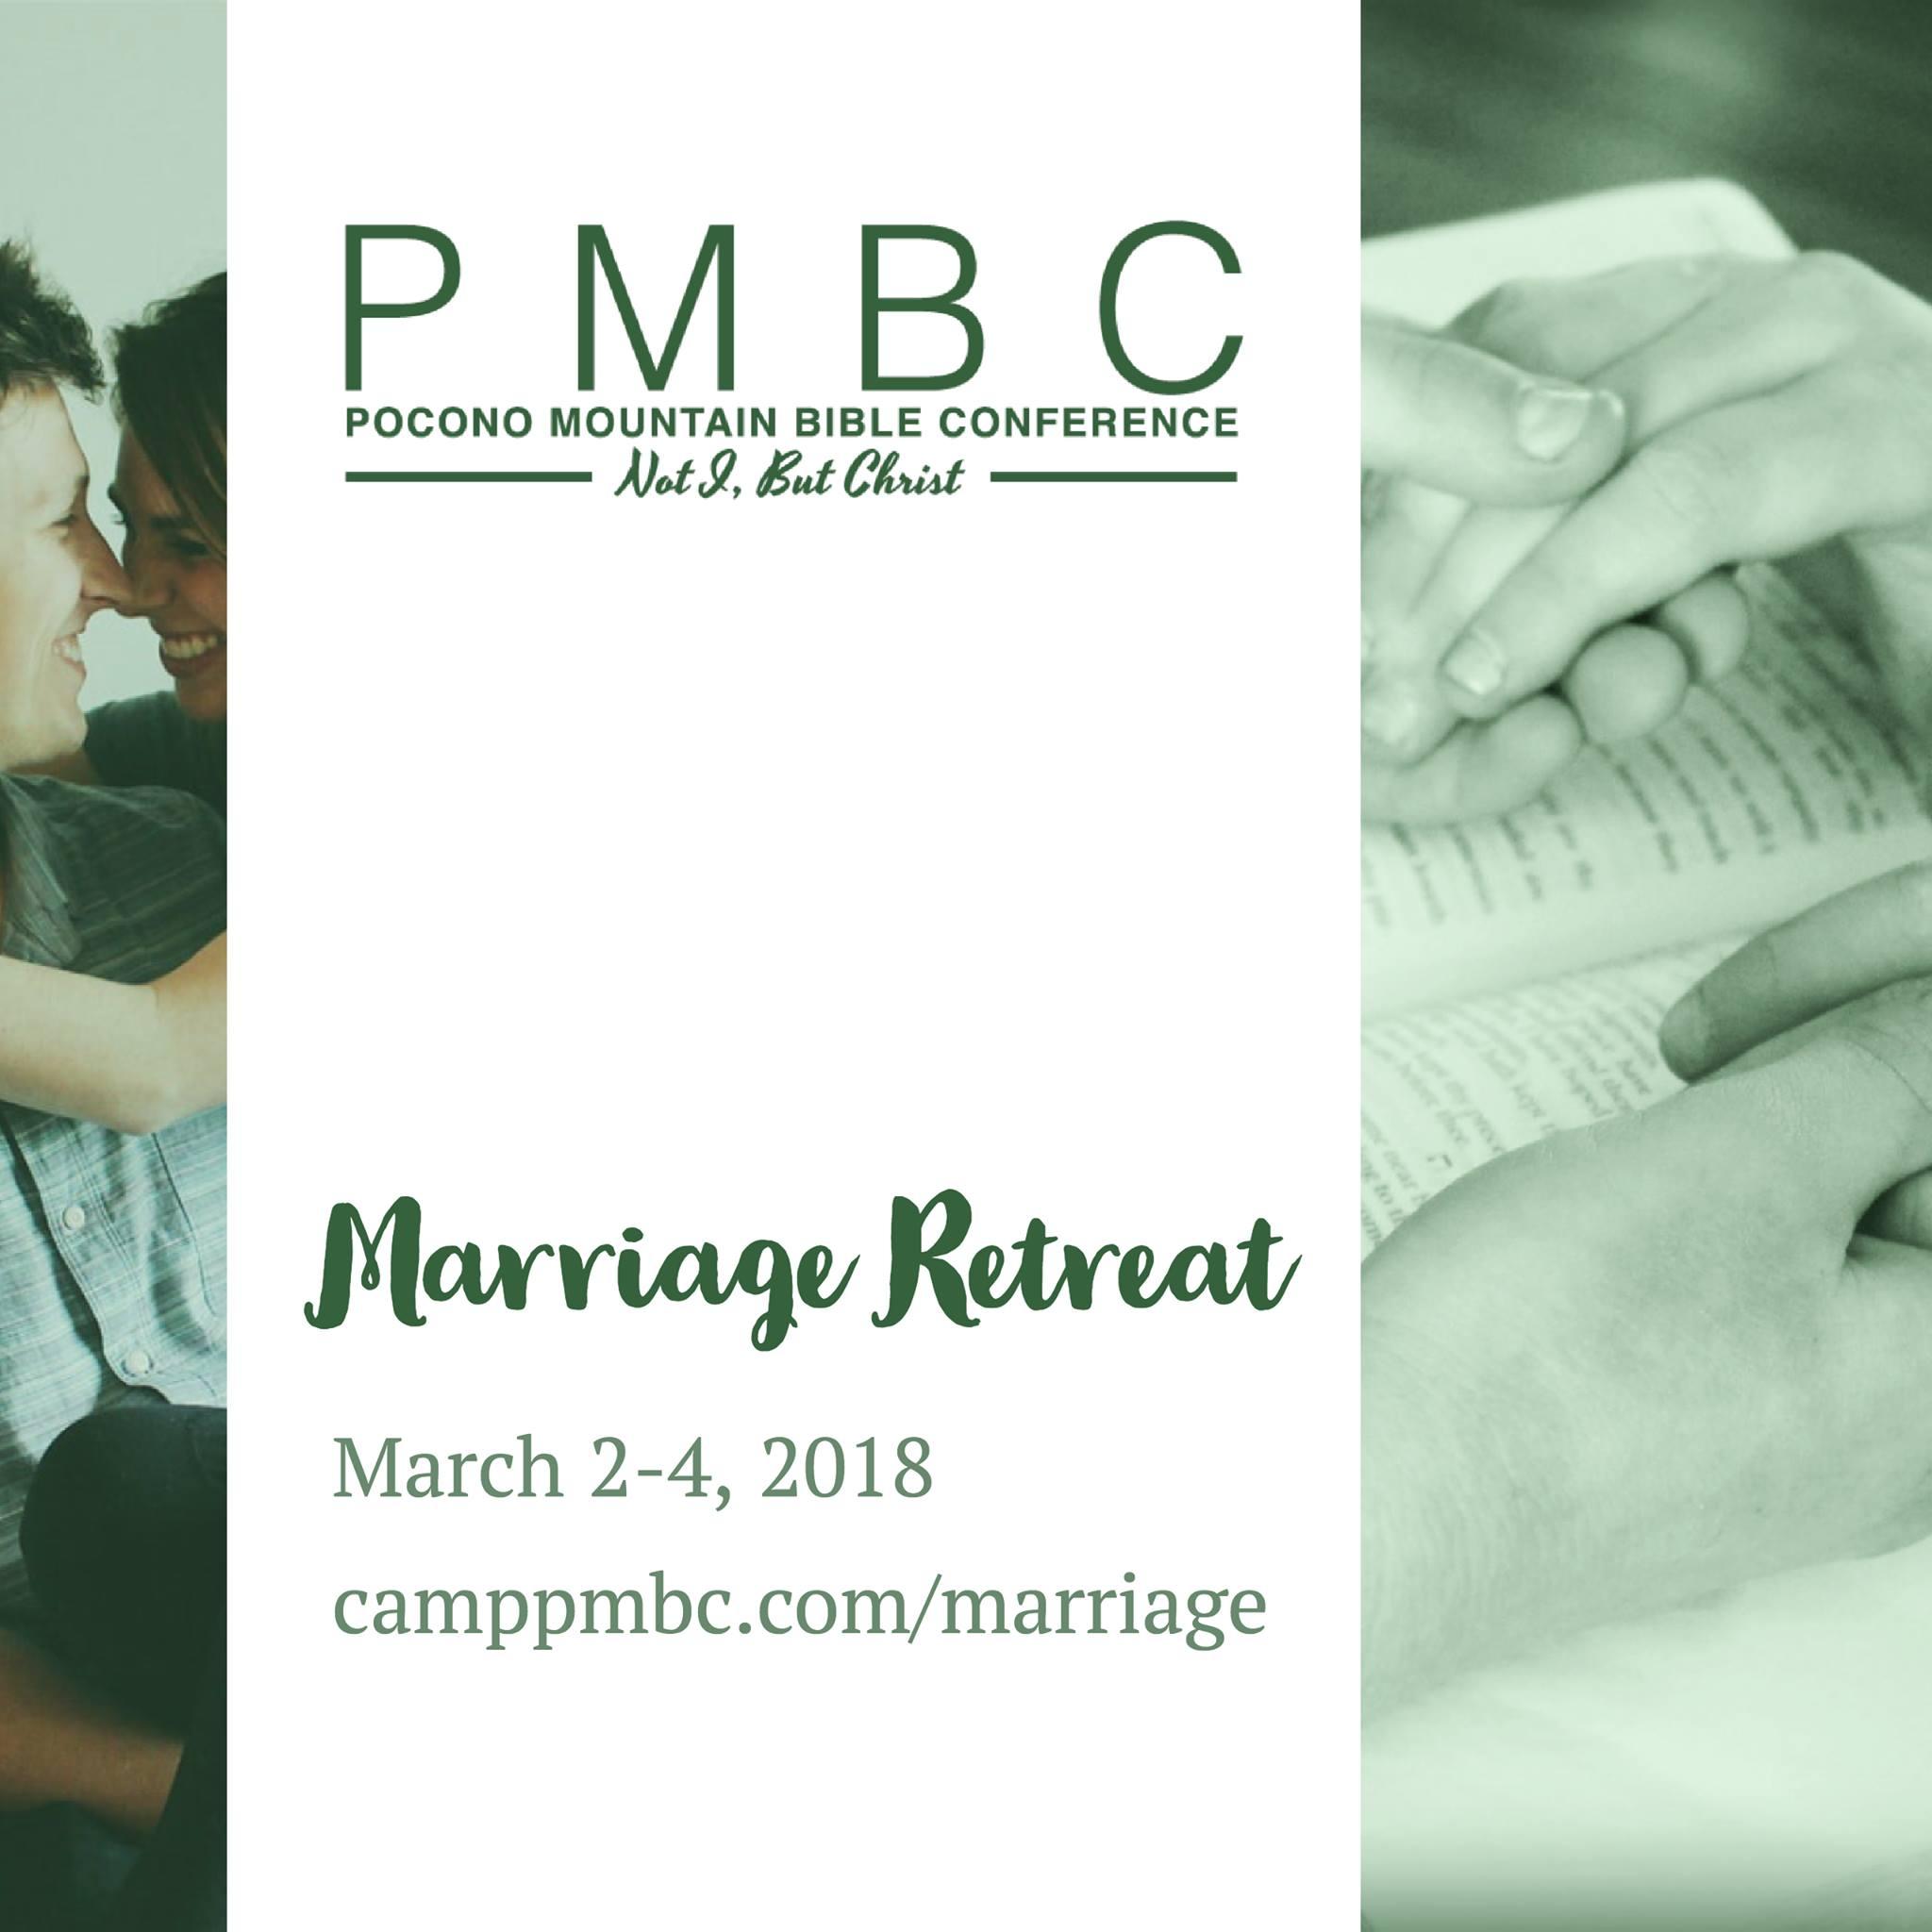 pmbc_marriage1.jpg